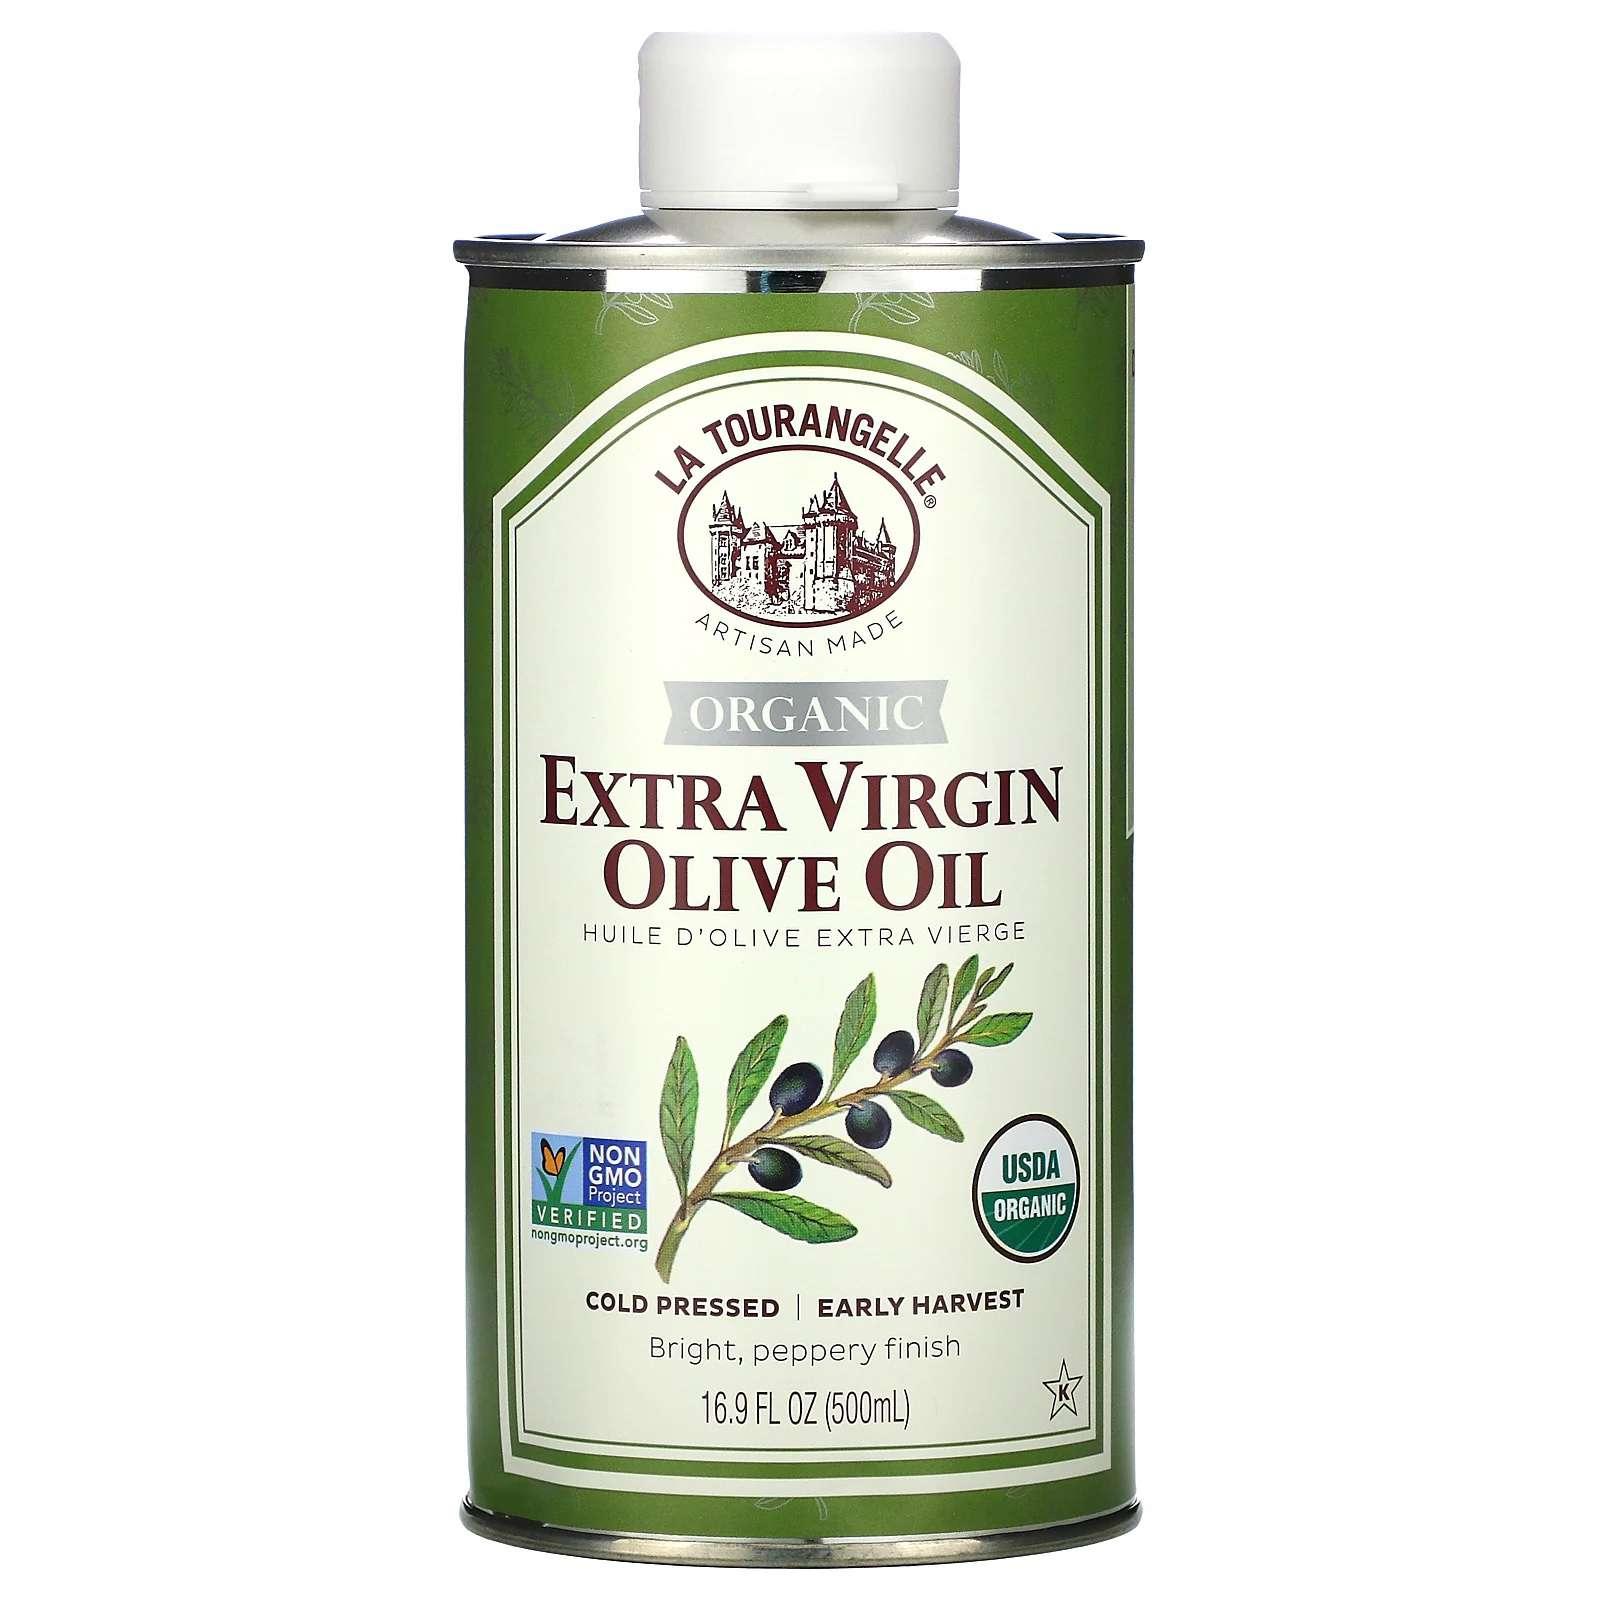 La Tourangelle Organic Extra Virgin Olive Oil